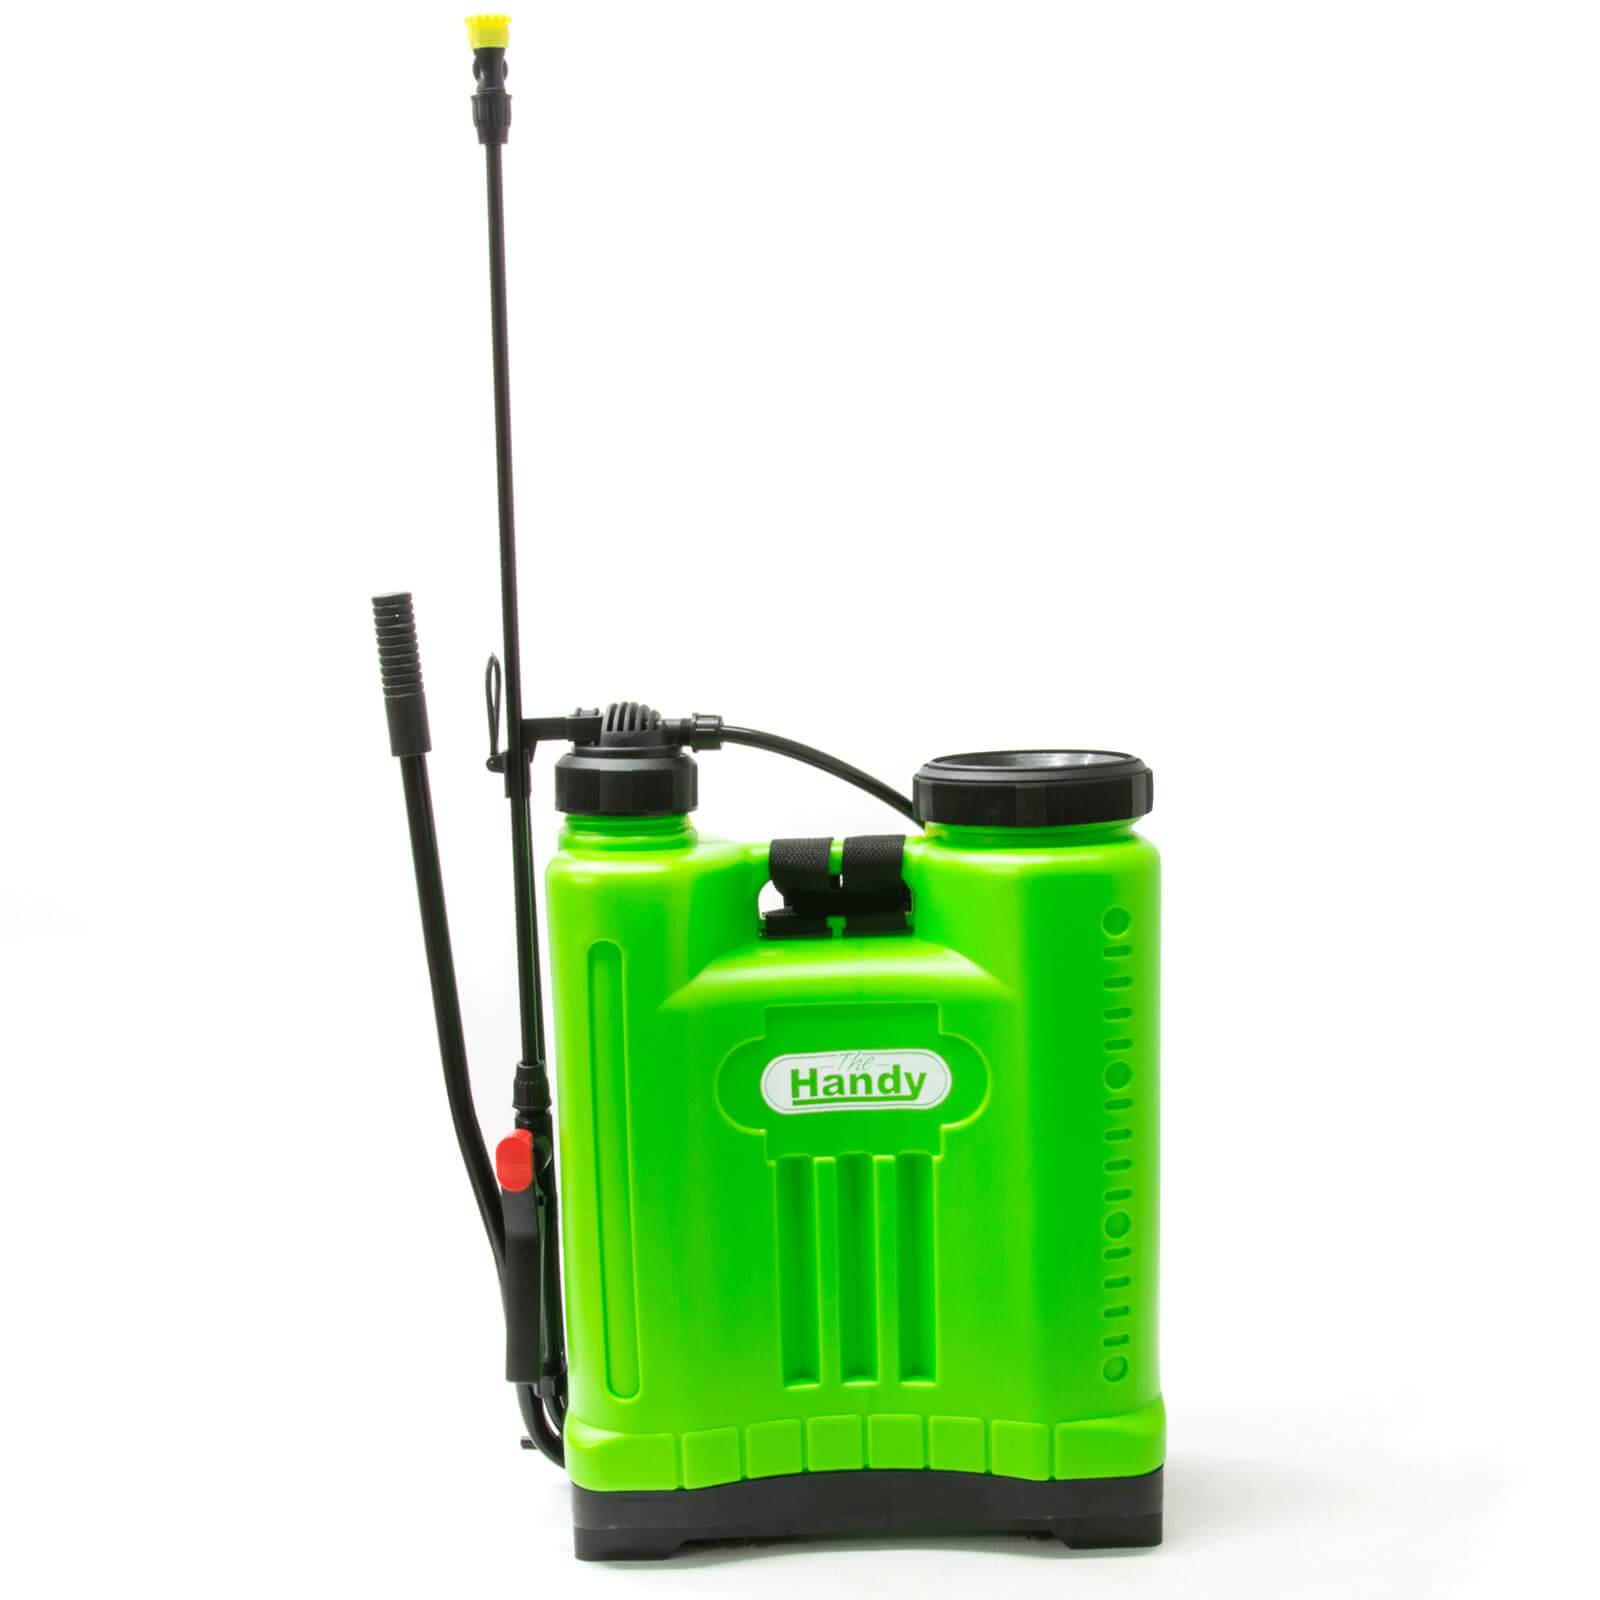 Handy THKS16LTR Knap Sack Water Pressure Sprayer 16l